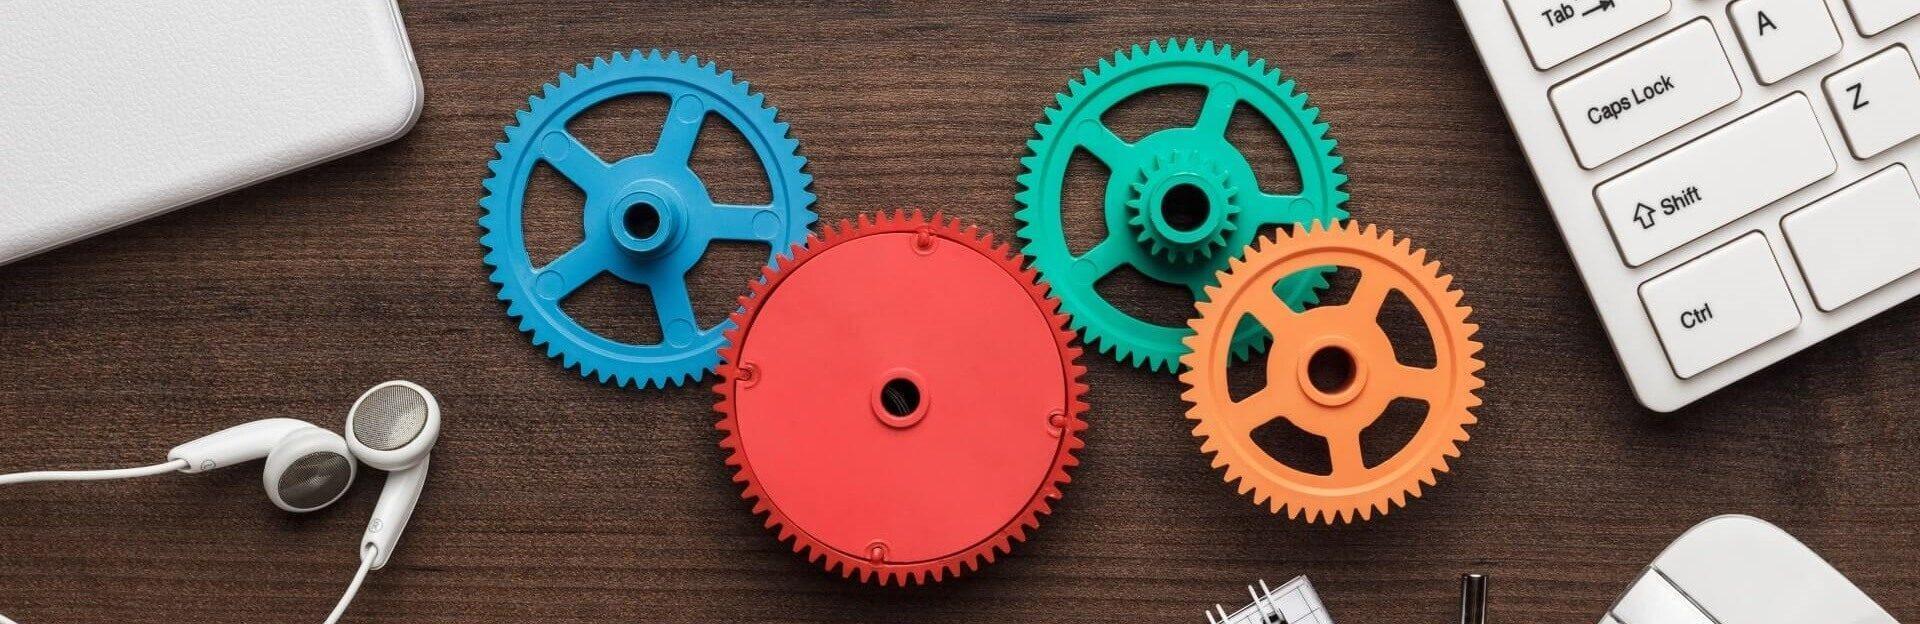 SAP EWM 2020 Enhanced Integration